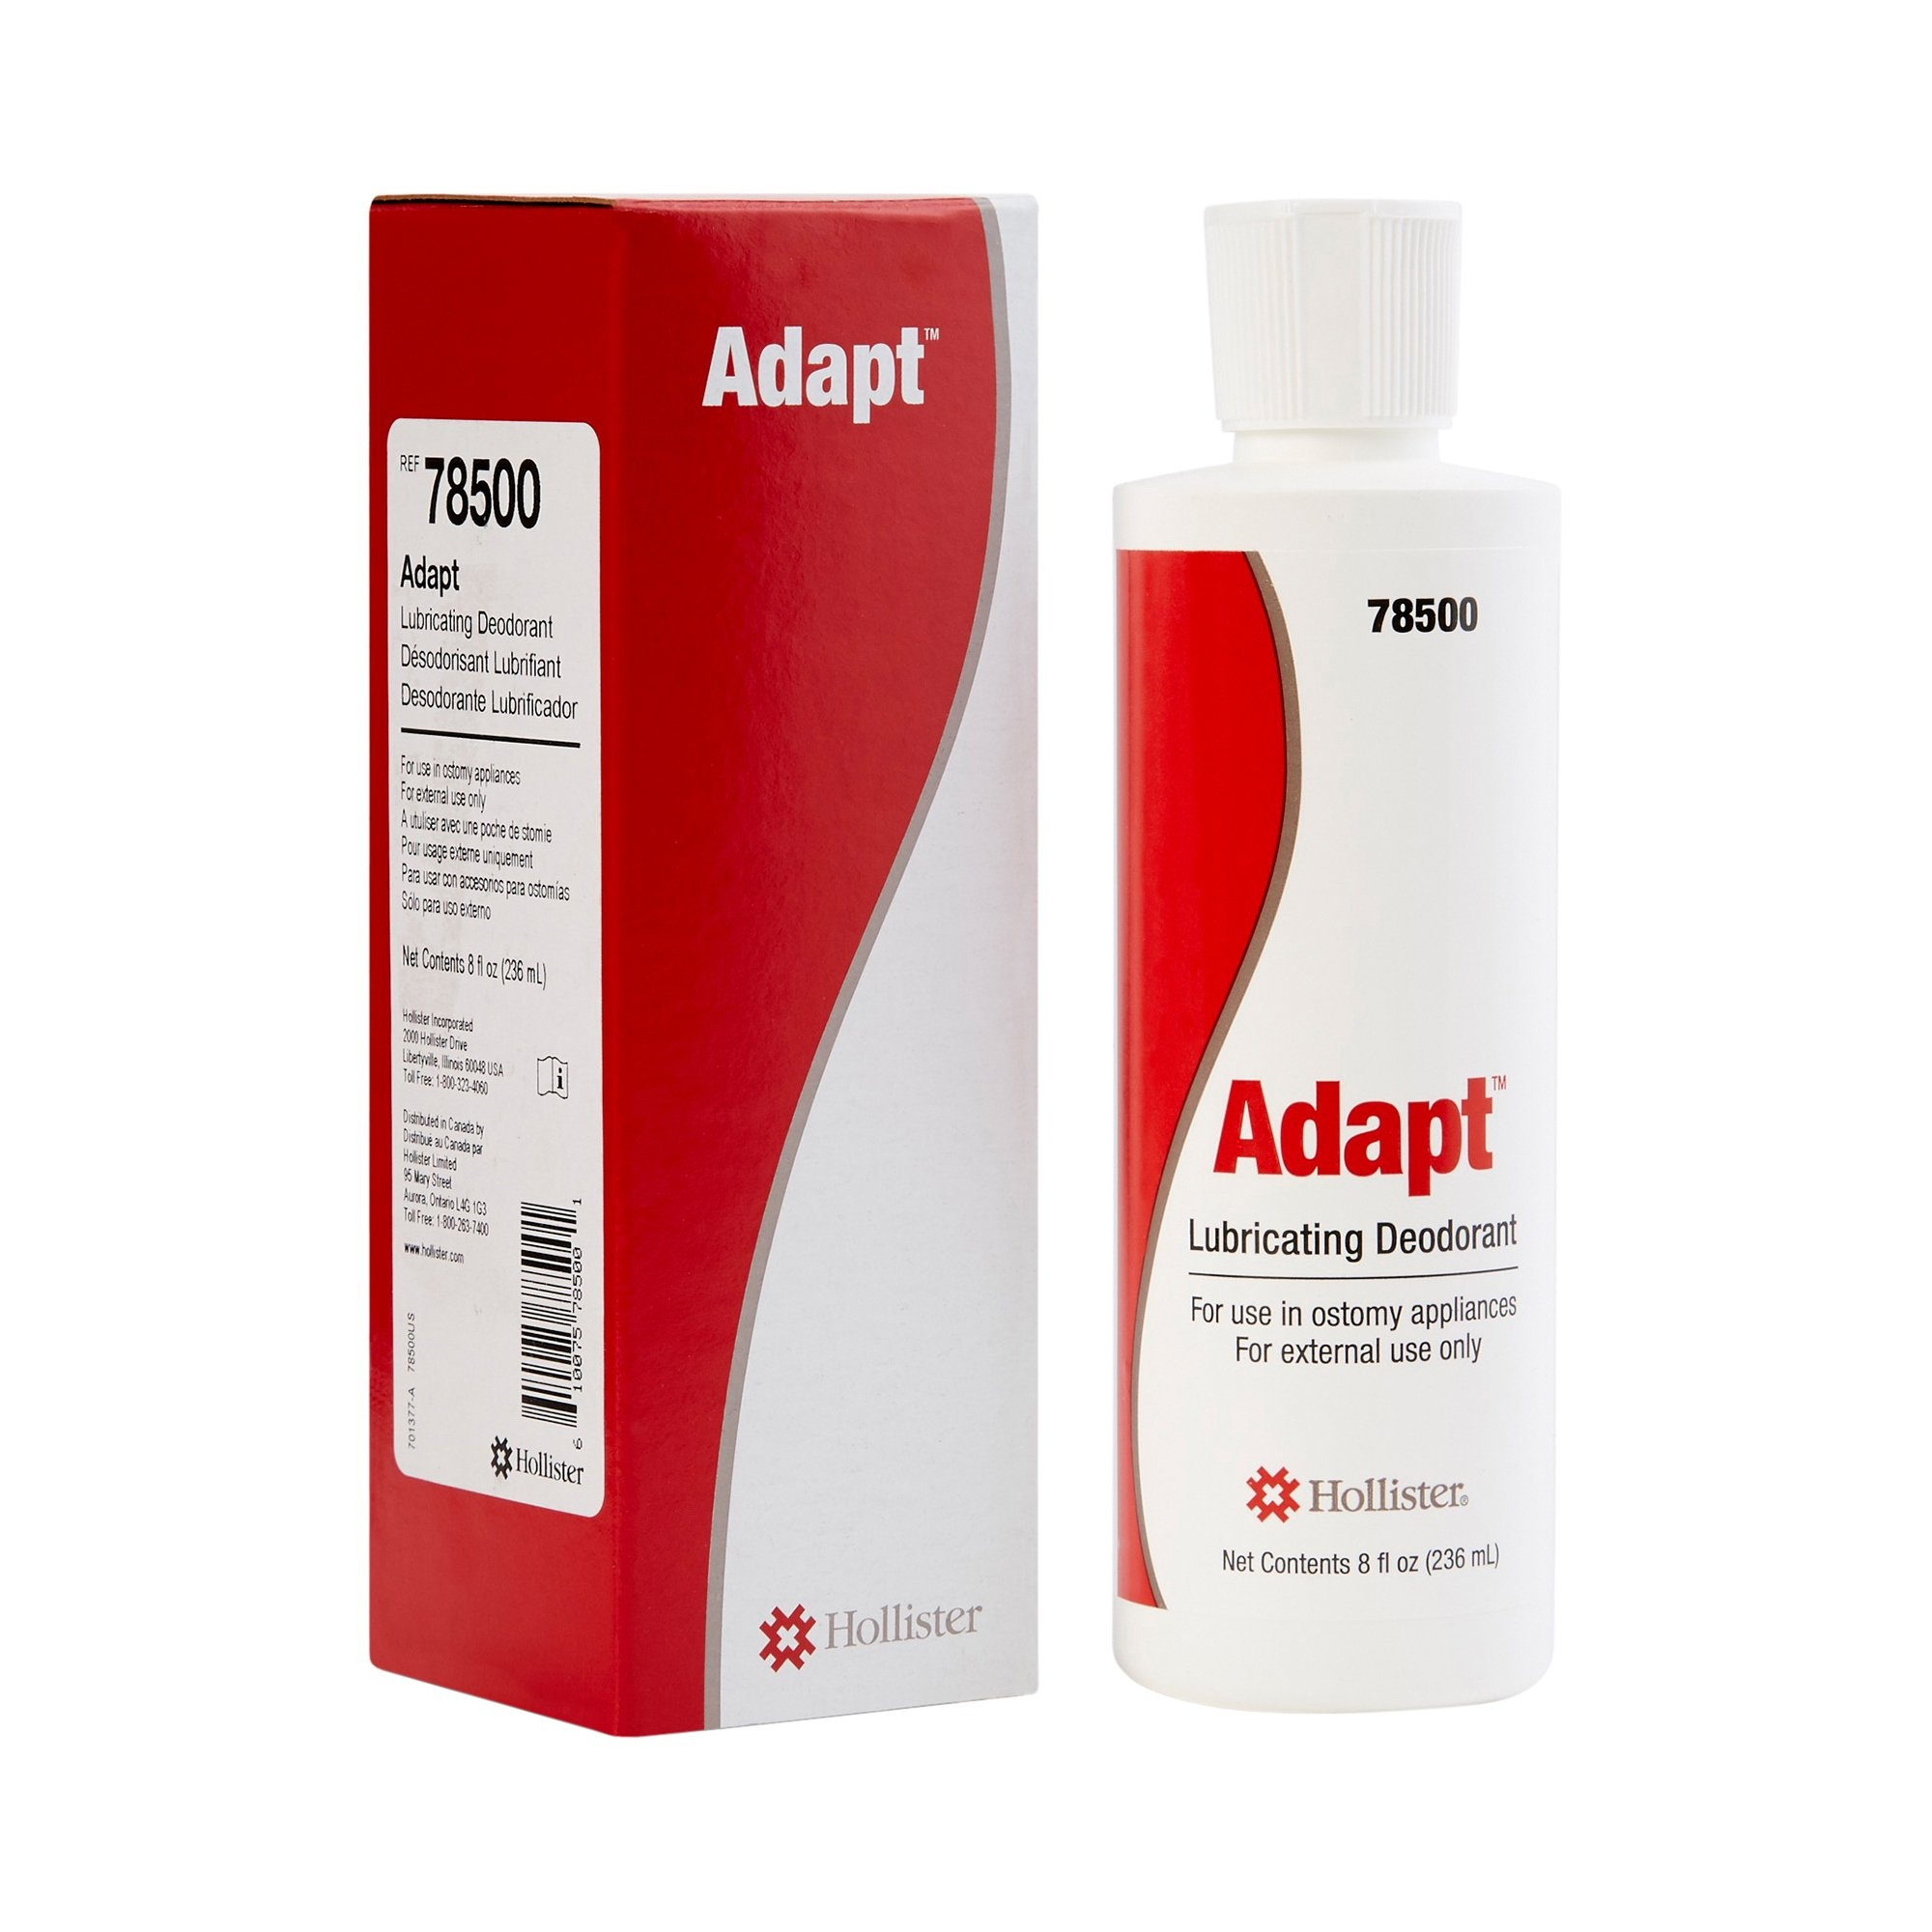 Hollister Adapt Lubricating Deodorant, 8 oz., 78500, 1 Each